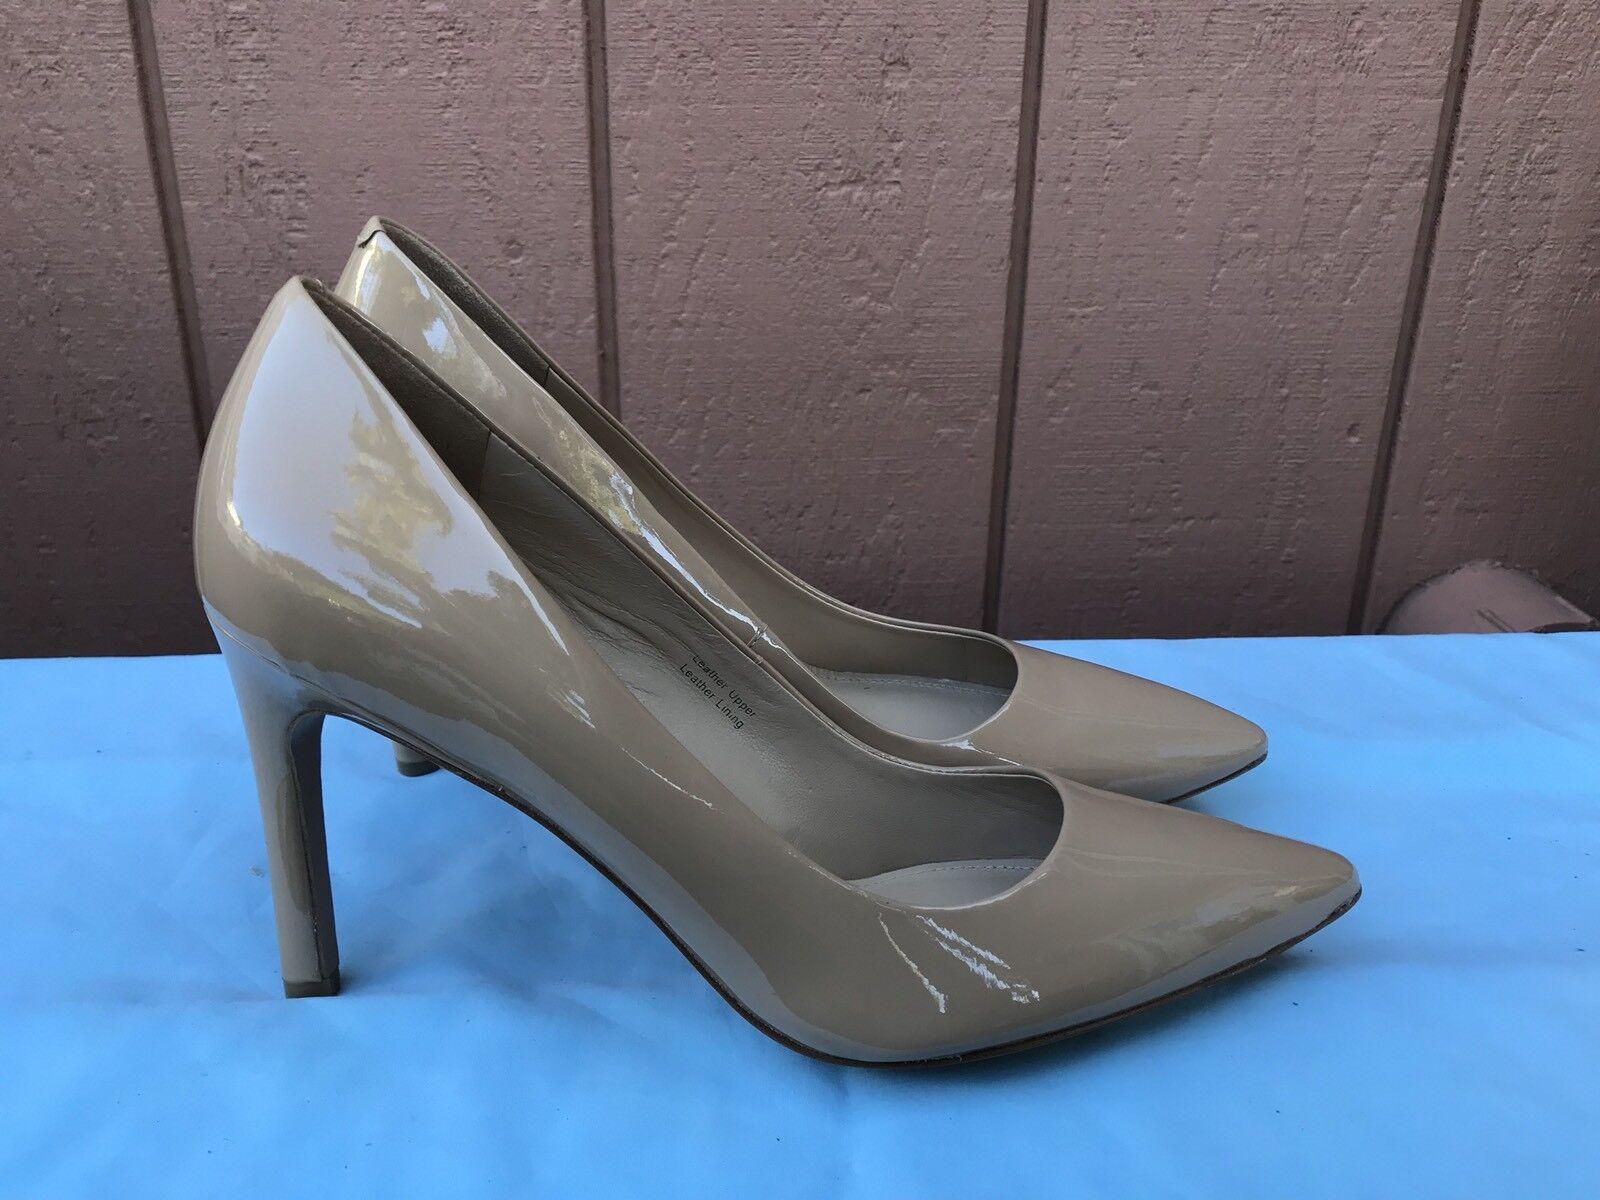 NEW $198 Women's US 9.5M VIA SPIGA Beige Beige SPIGA Patent Leather Pointy Toe Pumps Heel A6 2b06fb